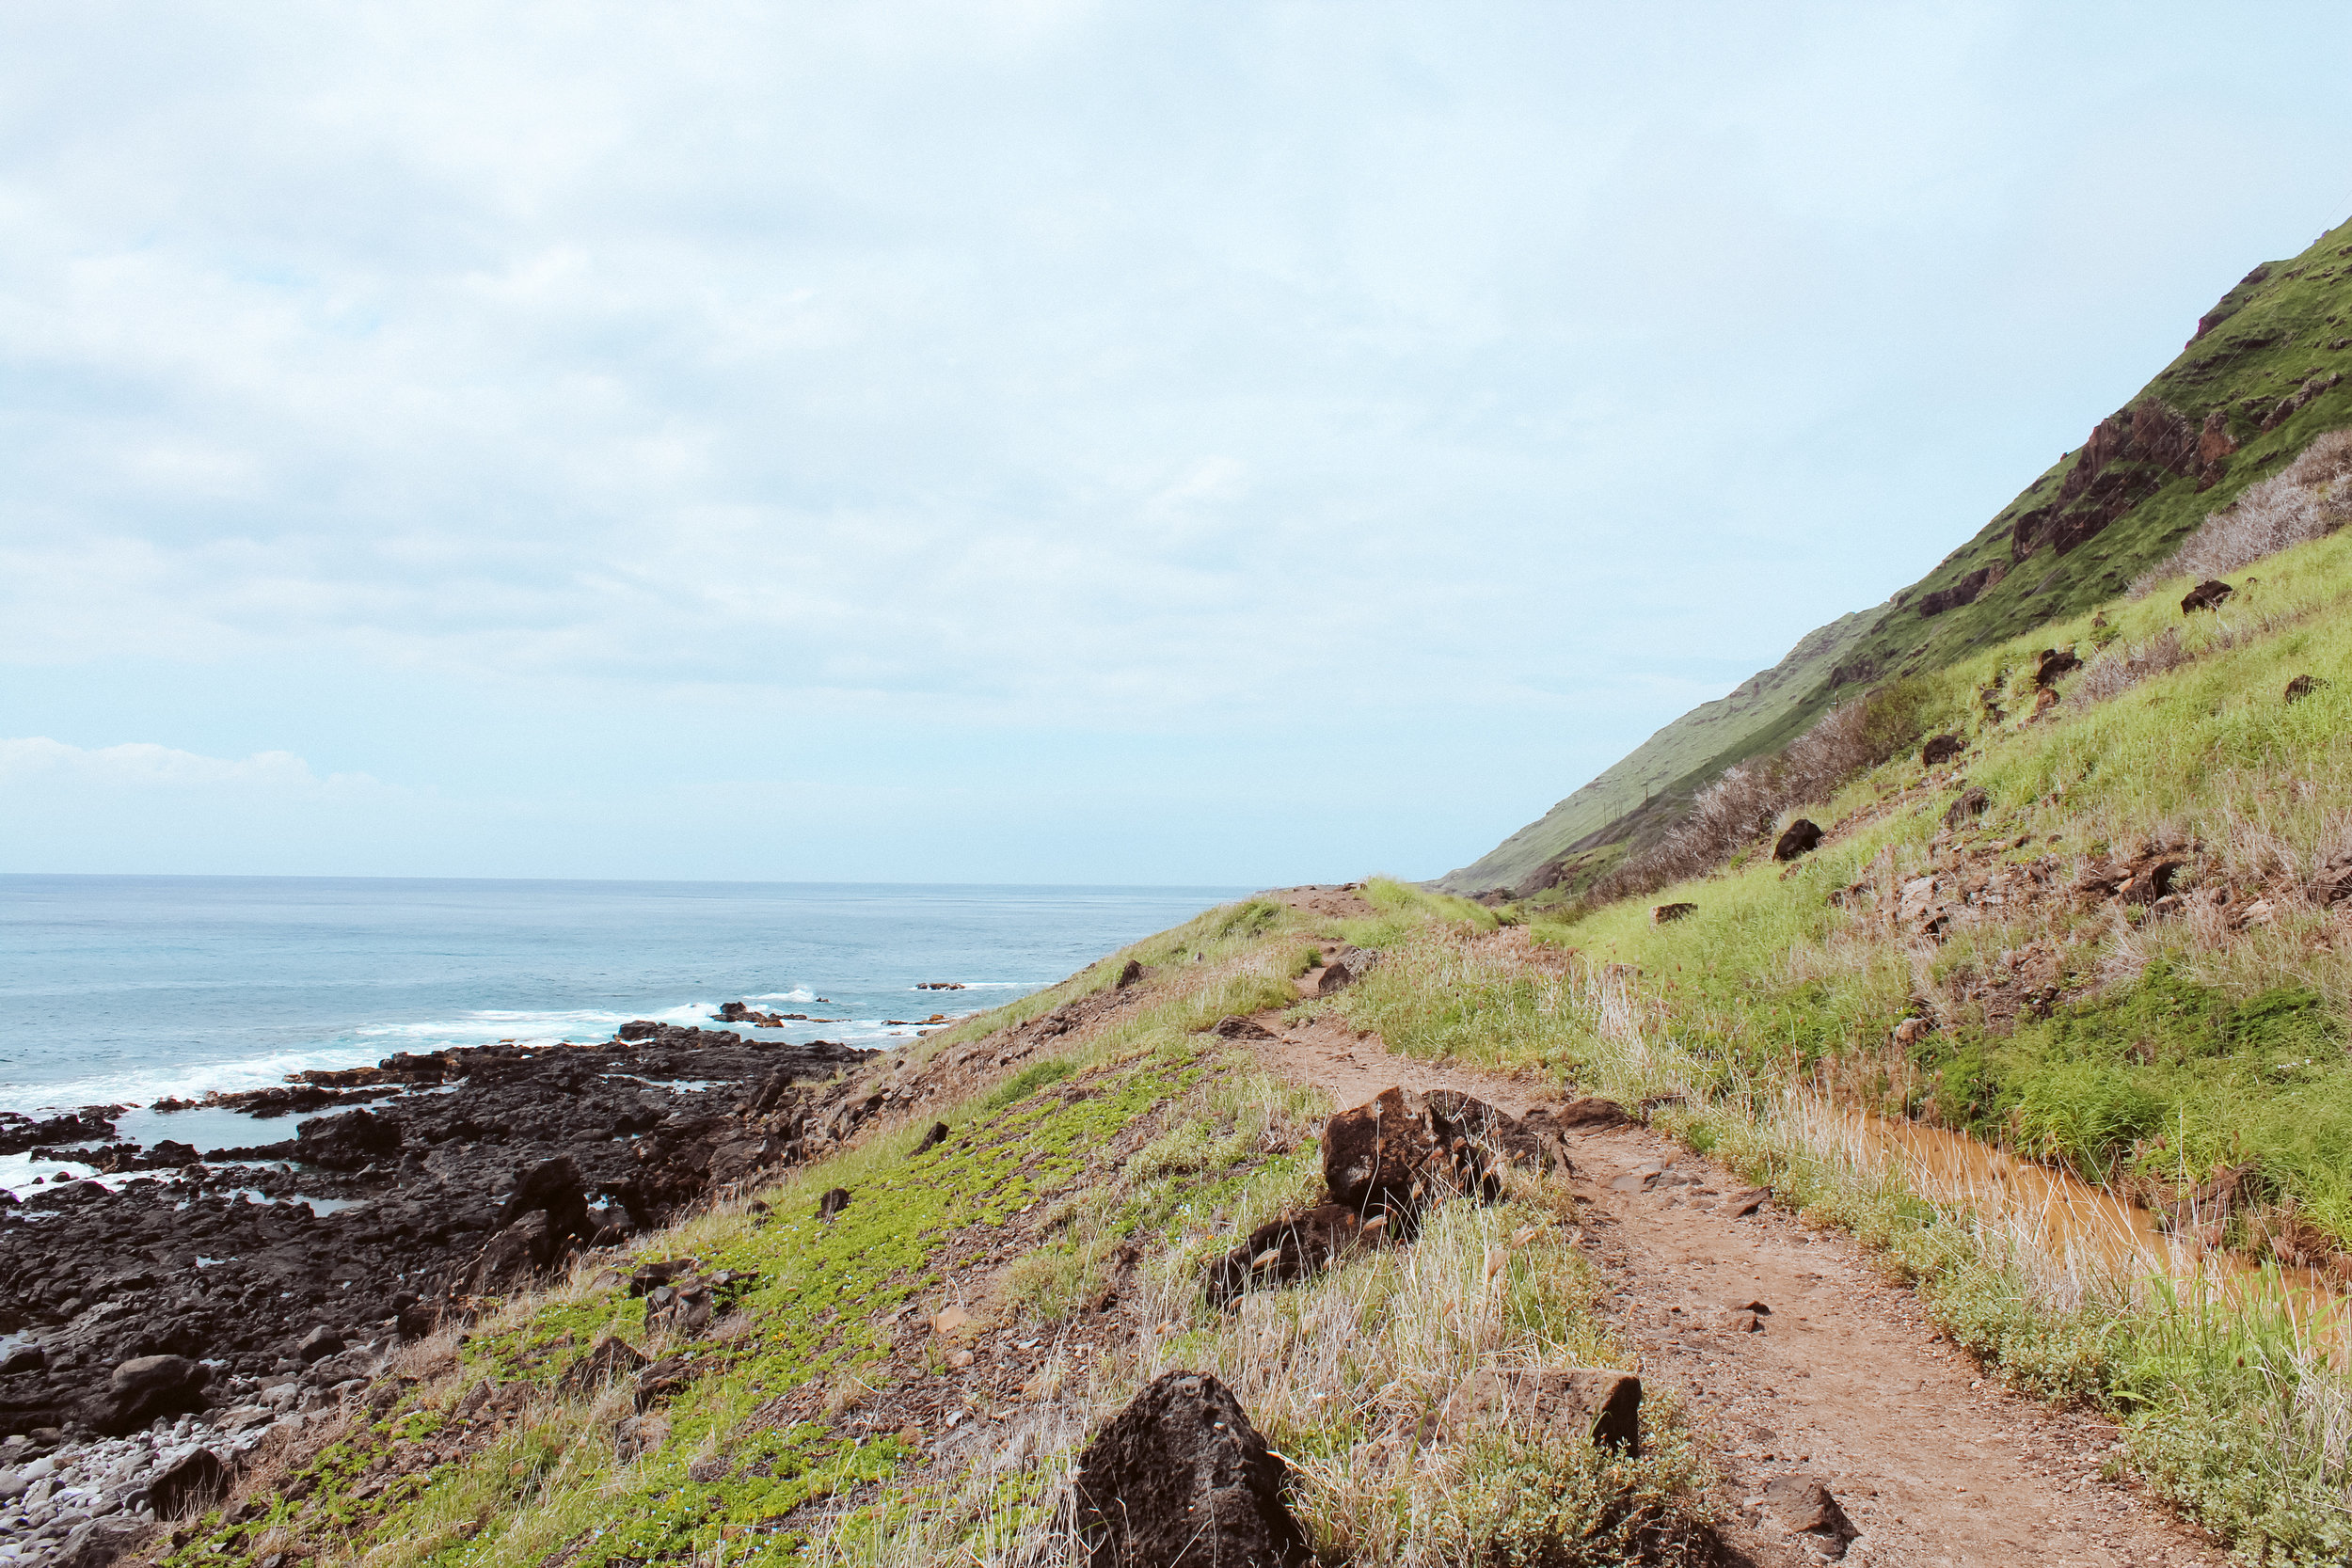 Looking onward towards Kaena Point.